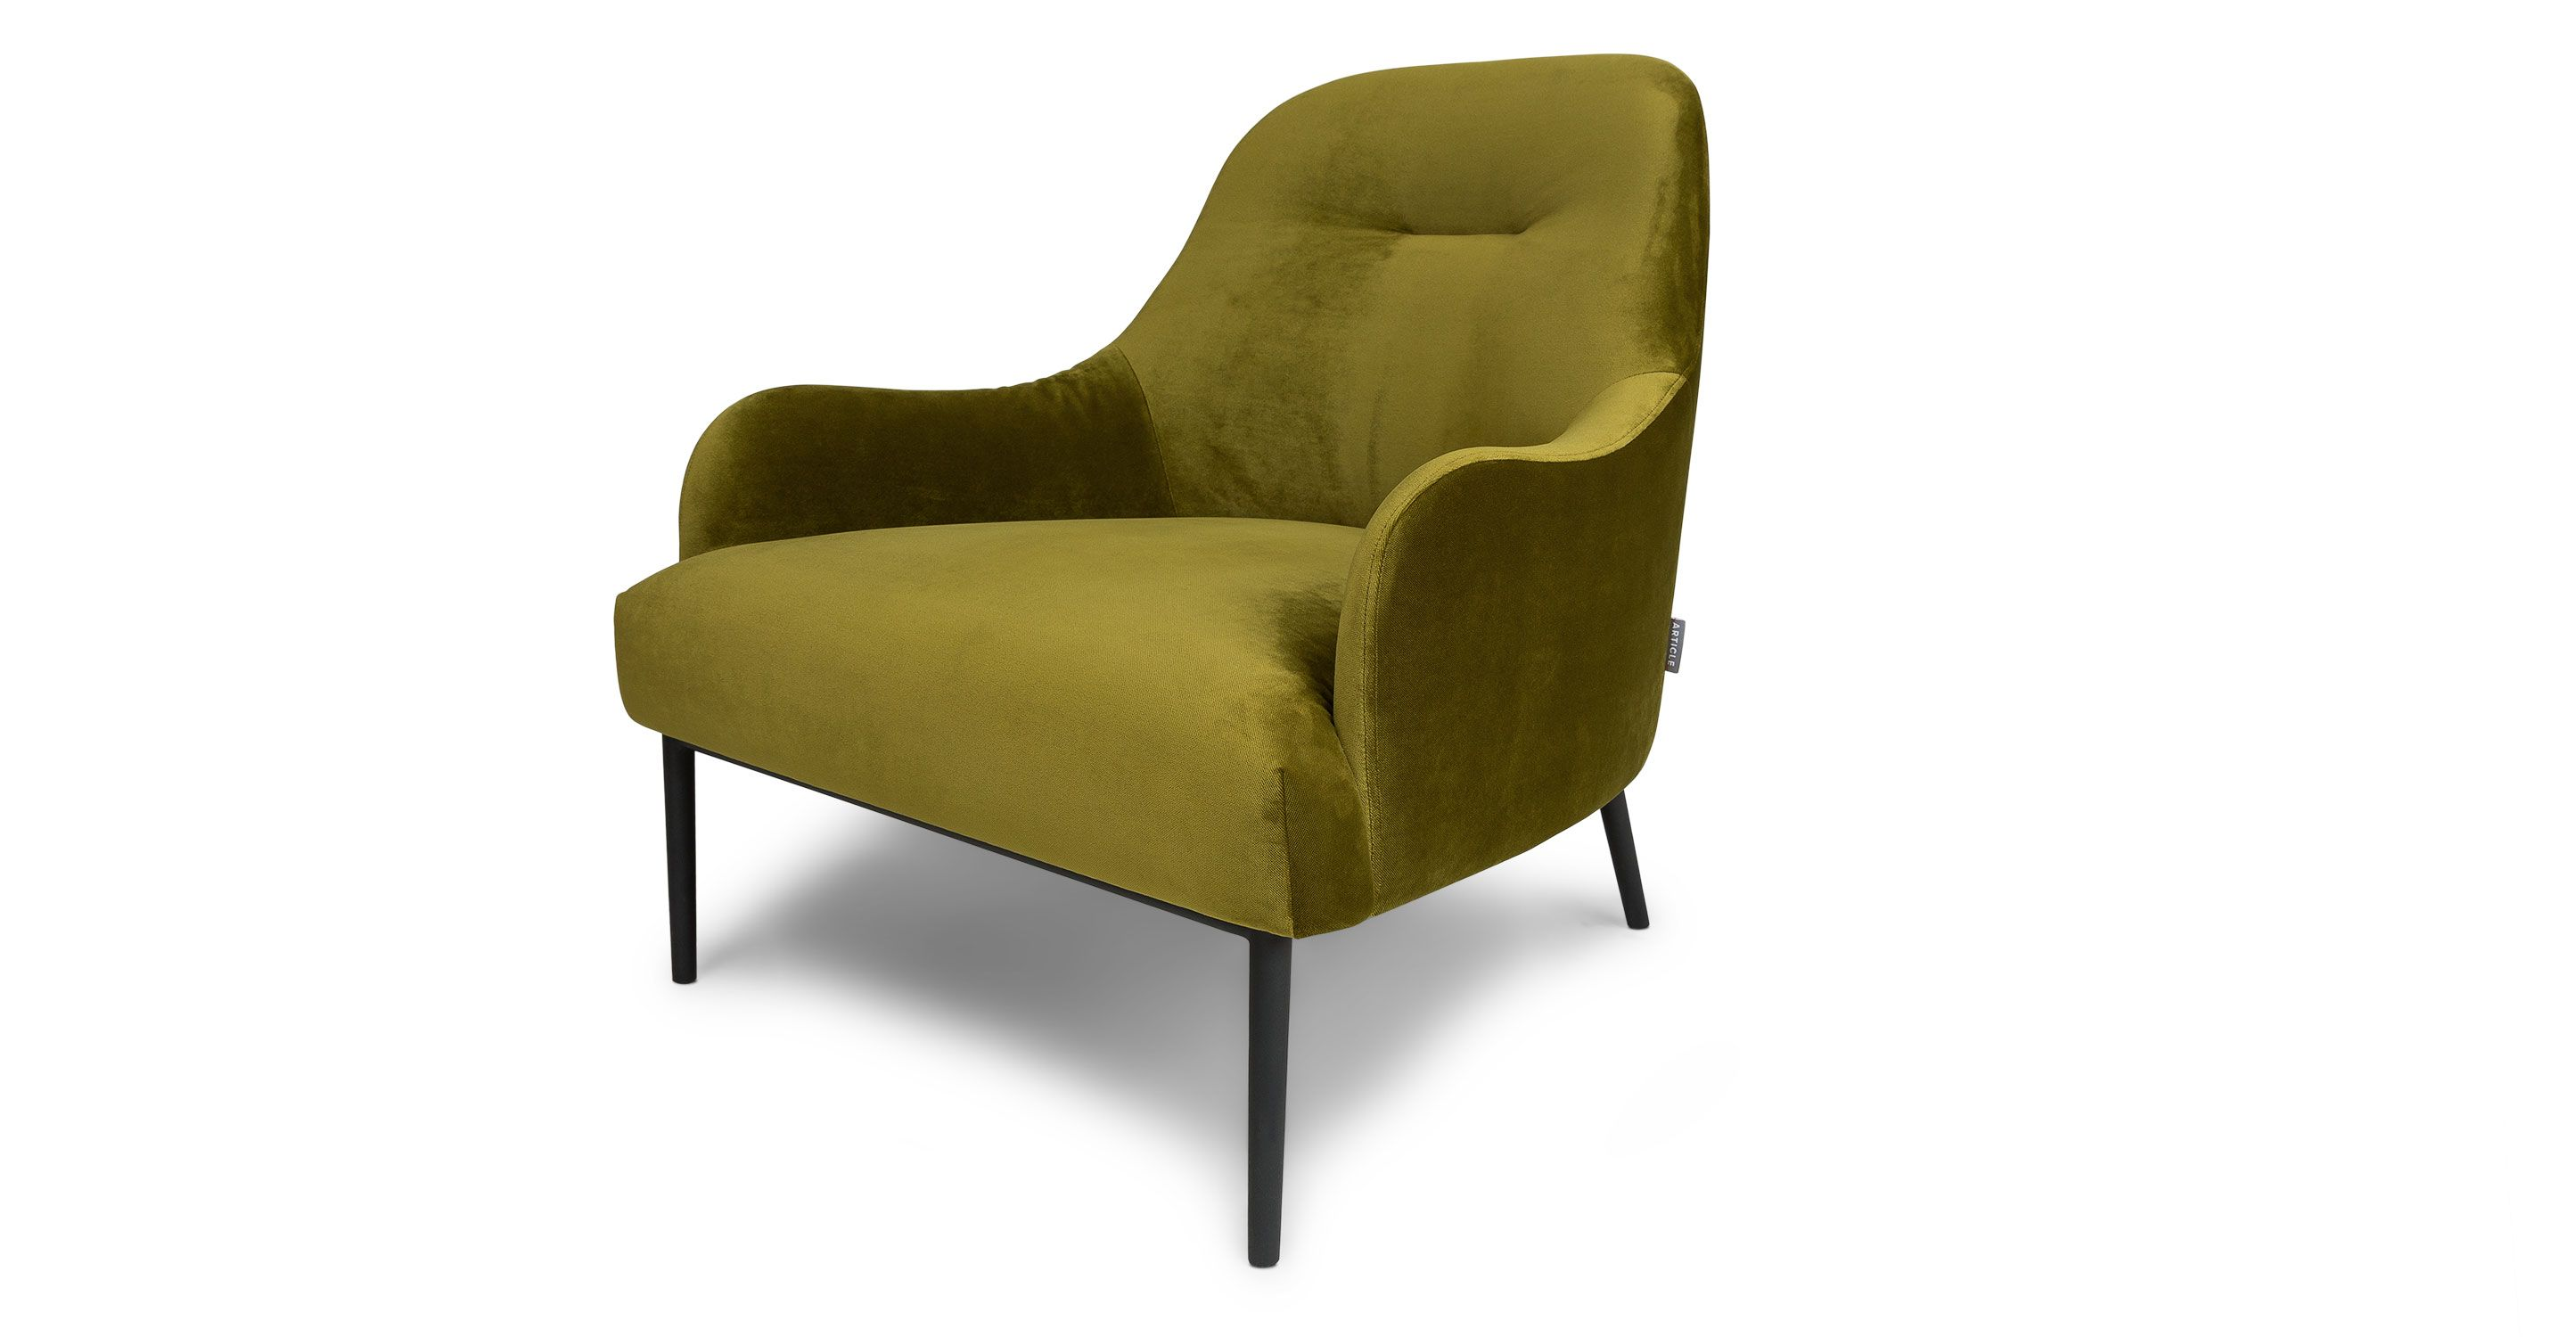 green velvet armchair black metal legs article embrace modern